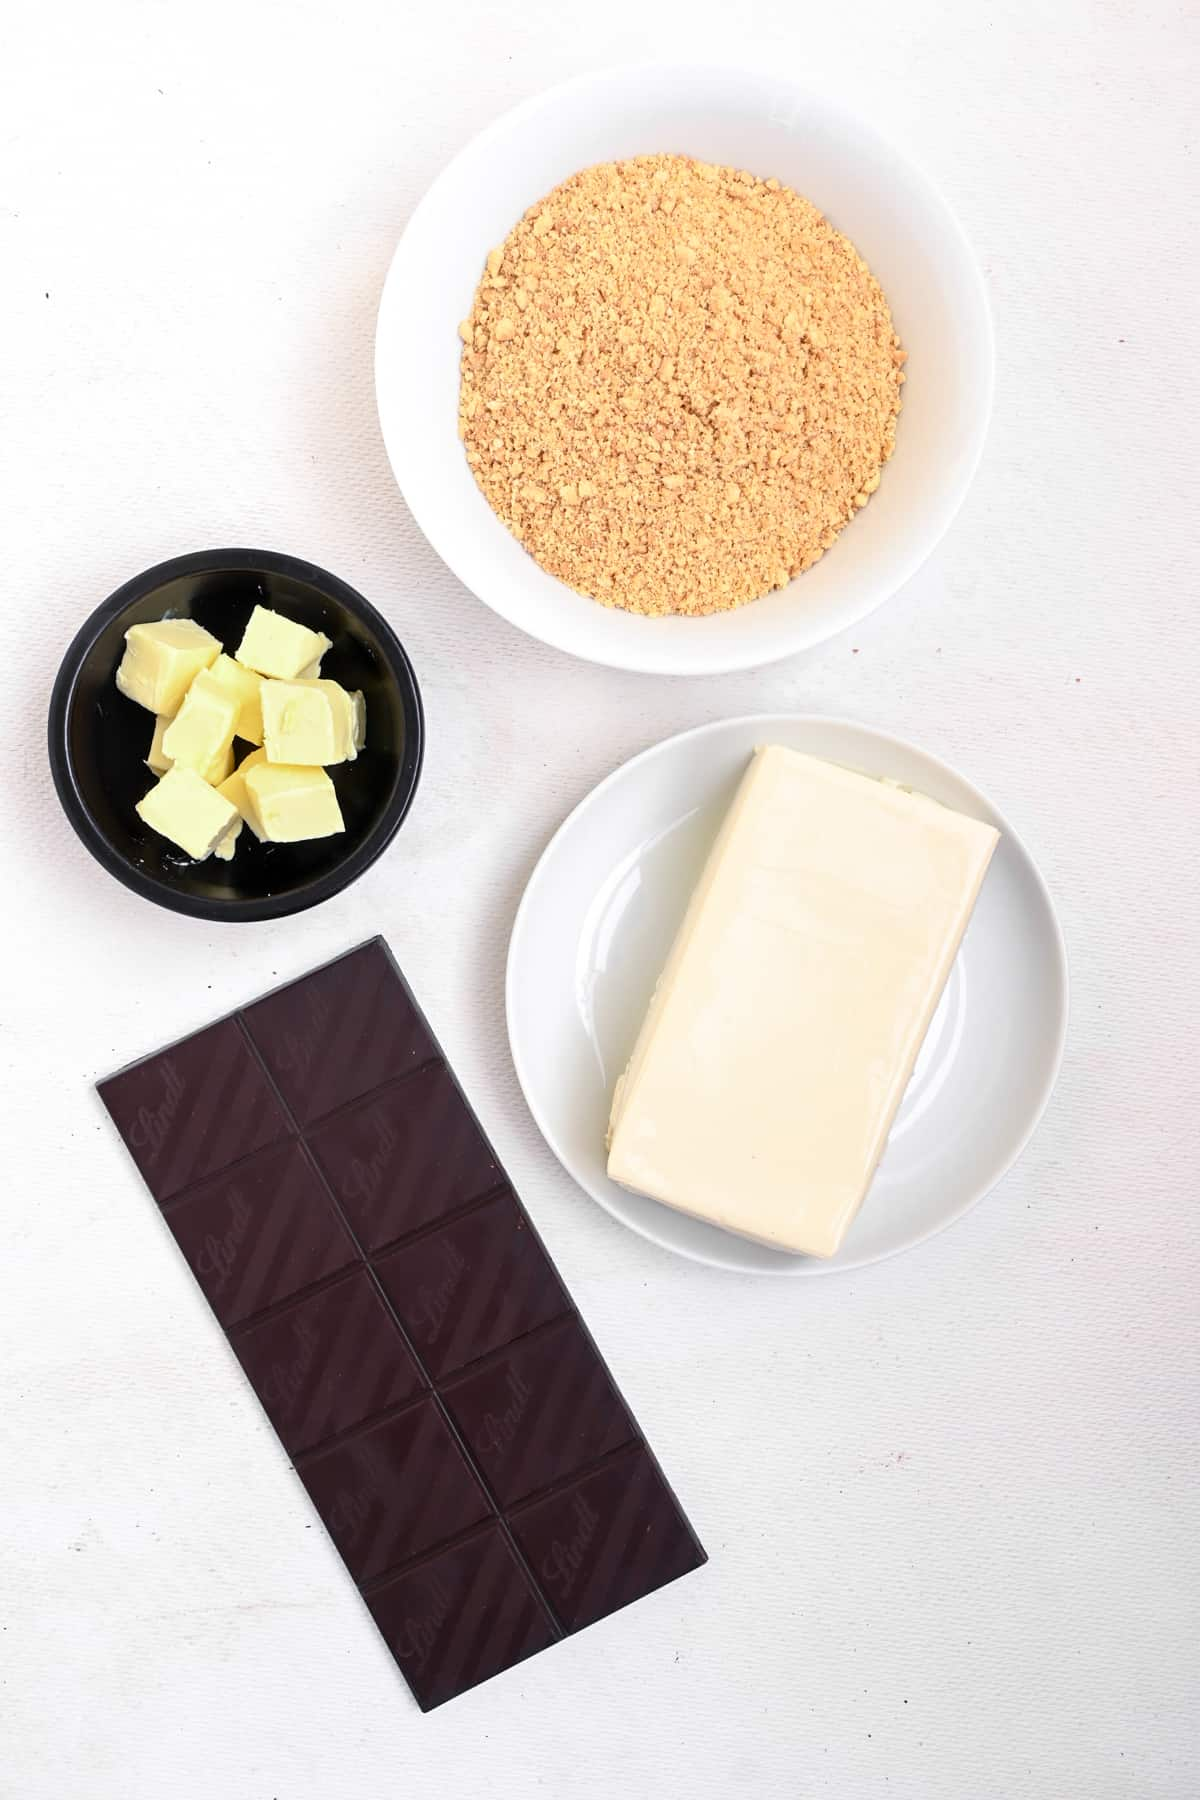 A bar of dark chocolate, vegan butter, a block of silken tofu and crumbled biscuits.